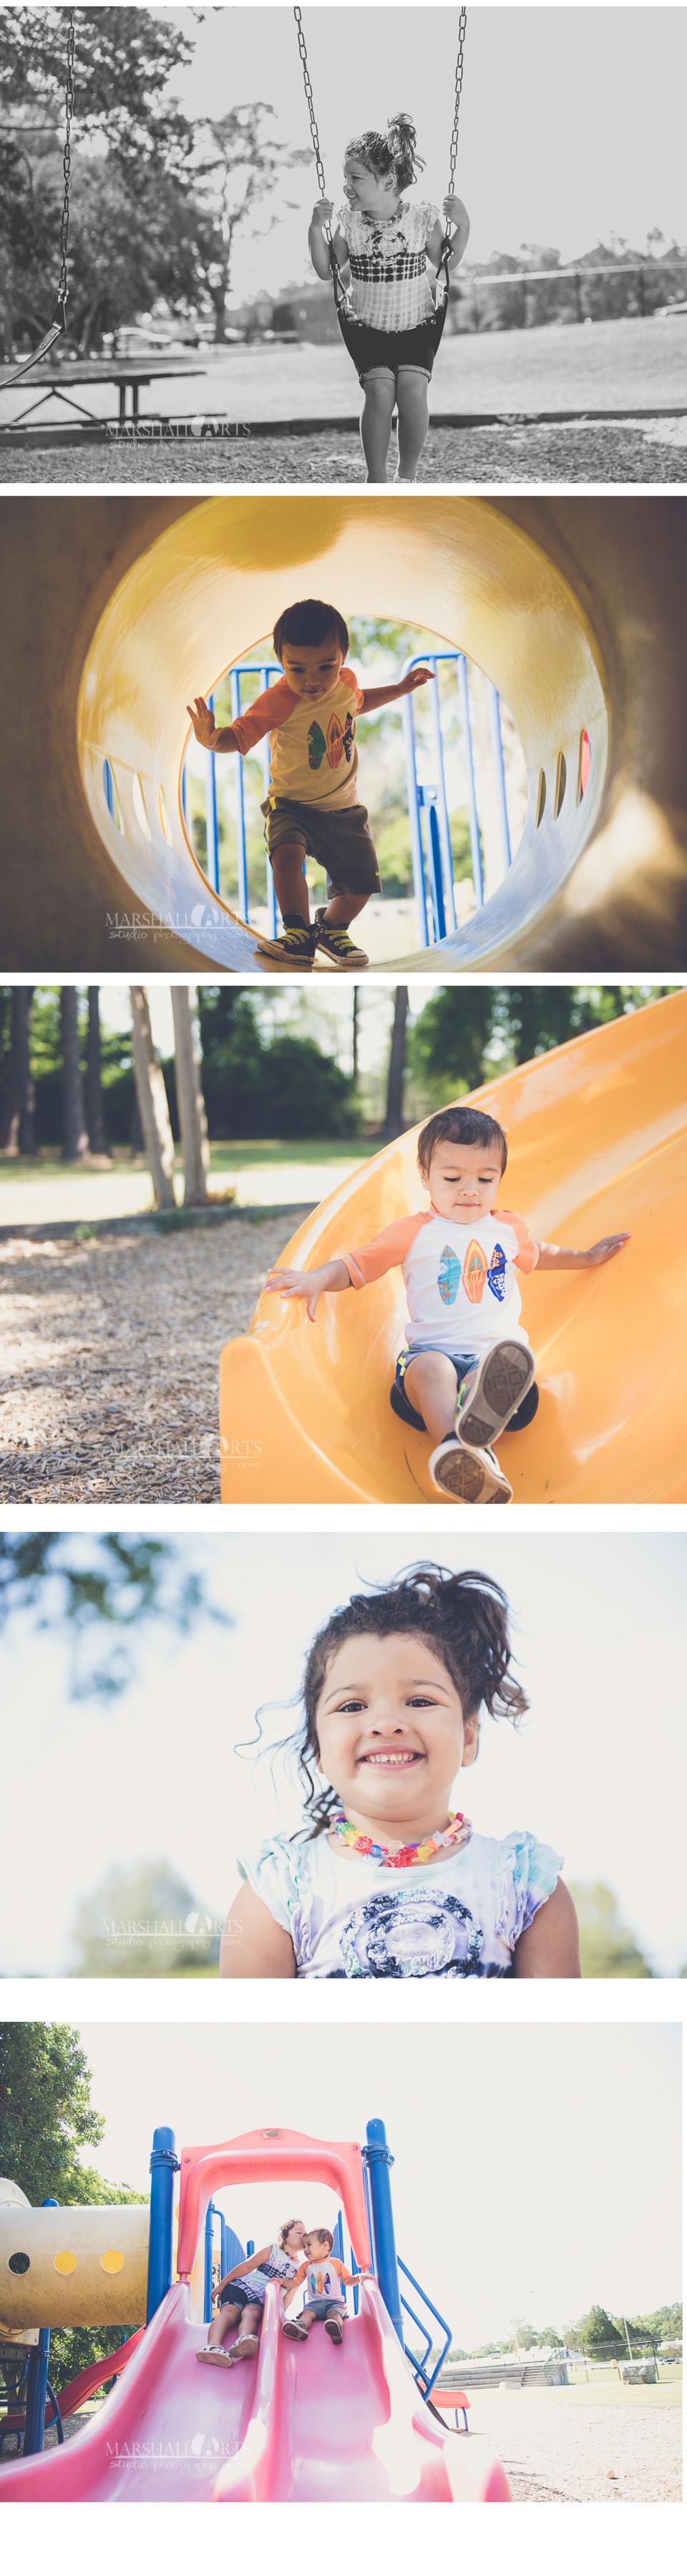 Chesapeake Park nikon d750 nikkor 24-70 2.8  fun family children